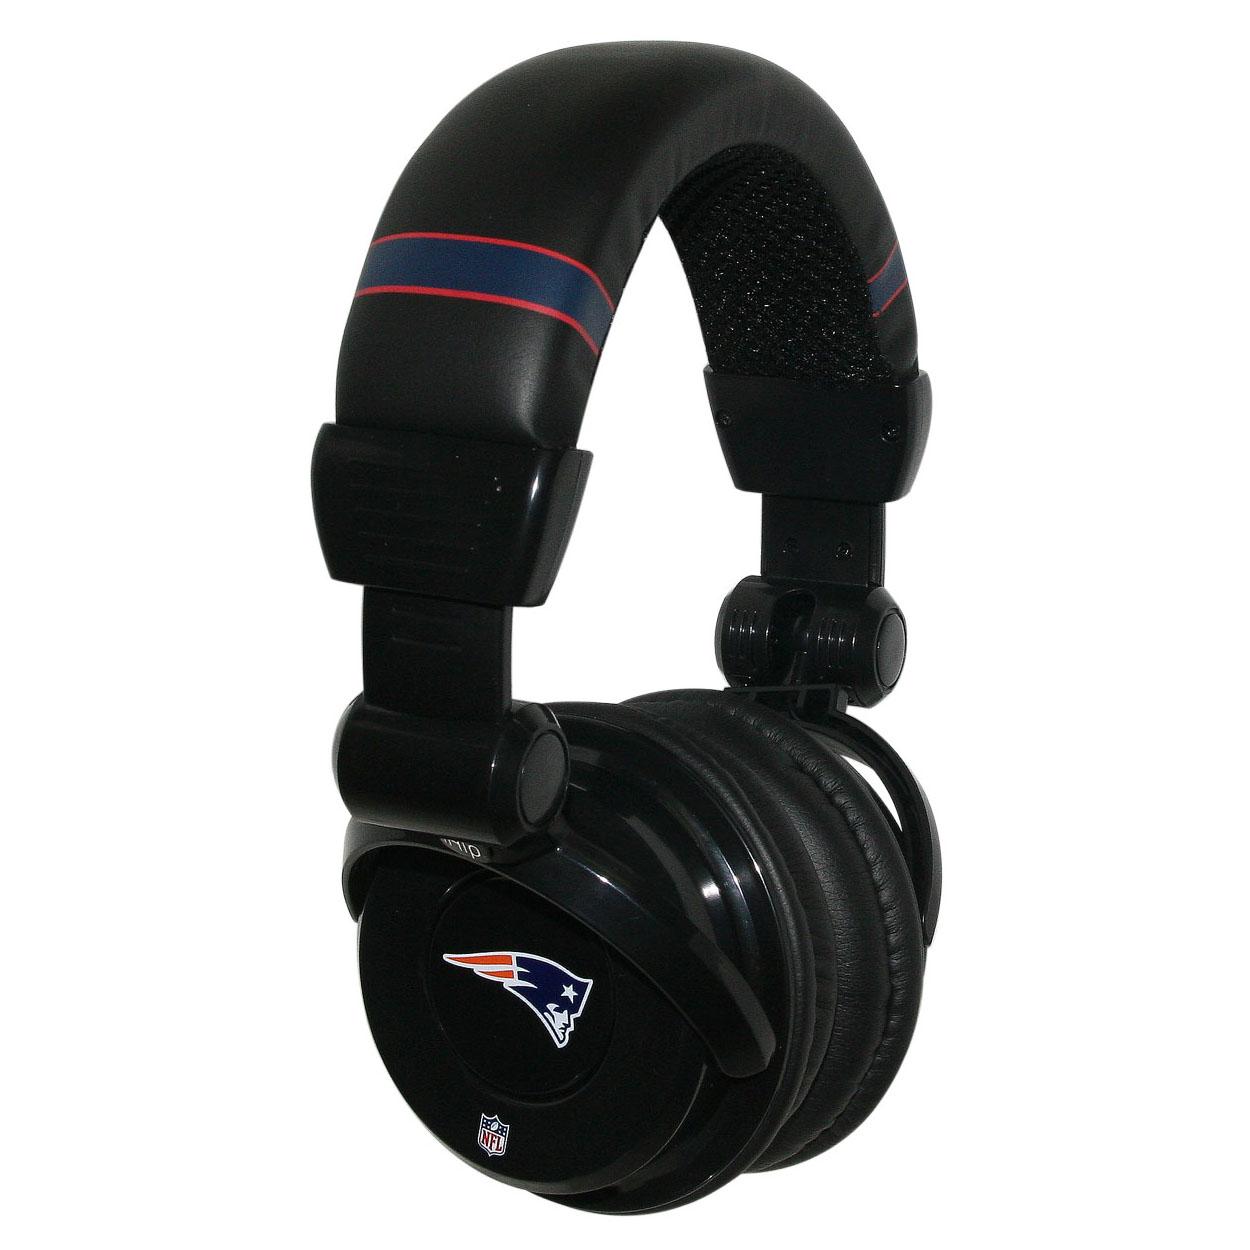 Ihip Pro Dj Headphones With Microphone - New Engla